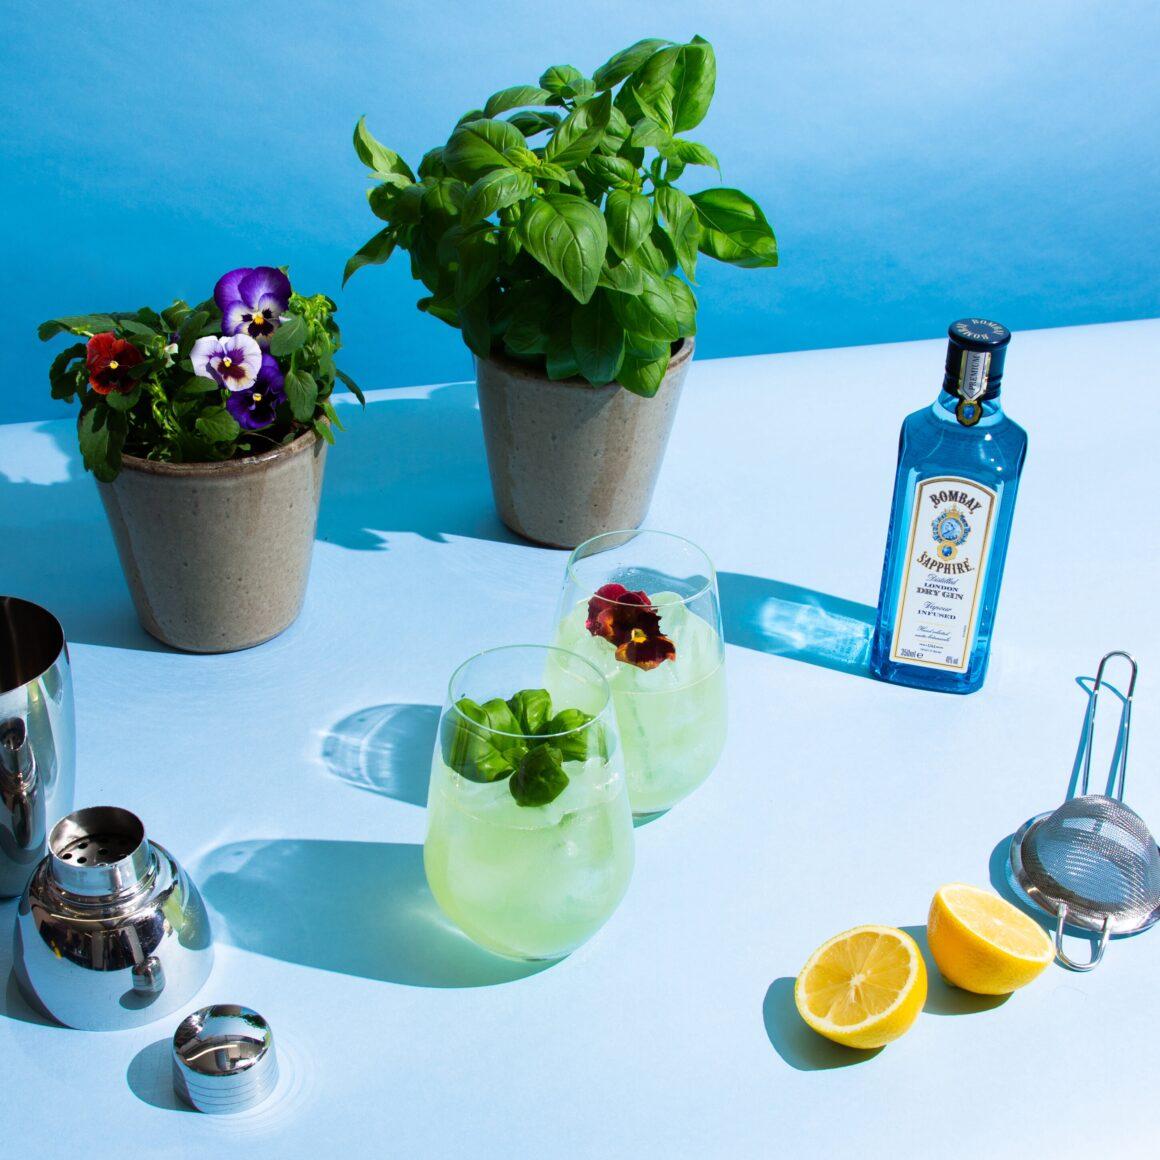 Grow Your Own Garnish Kits - Bacardi X Floom. Bombay Sapphire